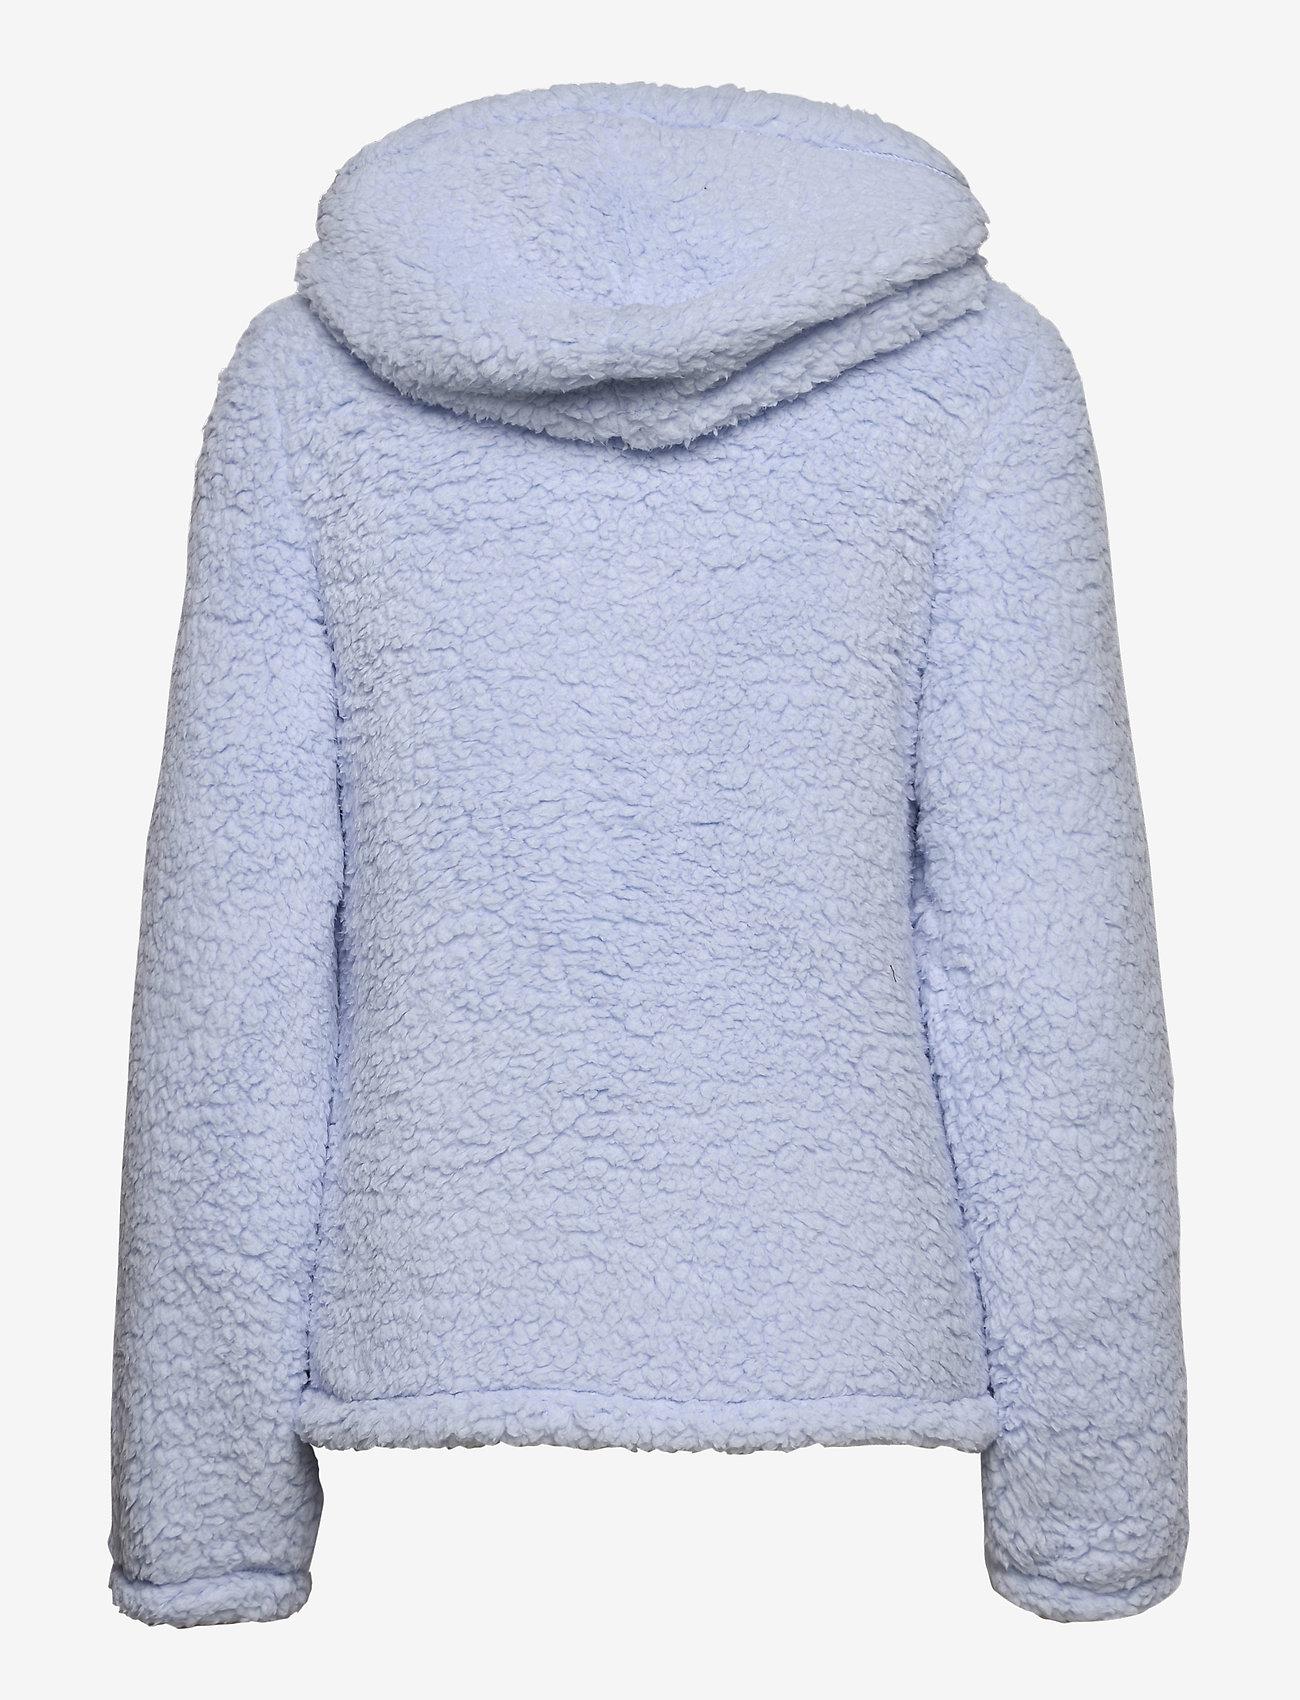 Hollister - HCo. GIRLS SWEATSHIRTS - fleece jassen - light blue - 1